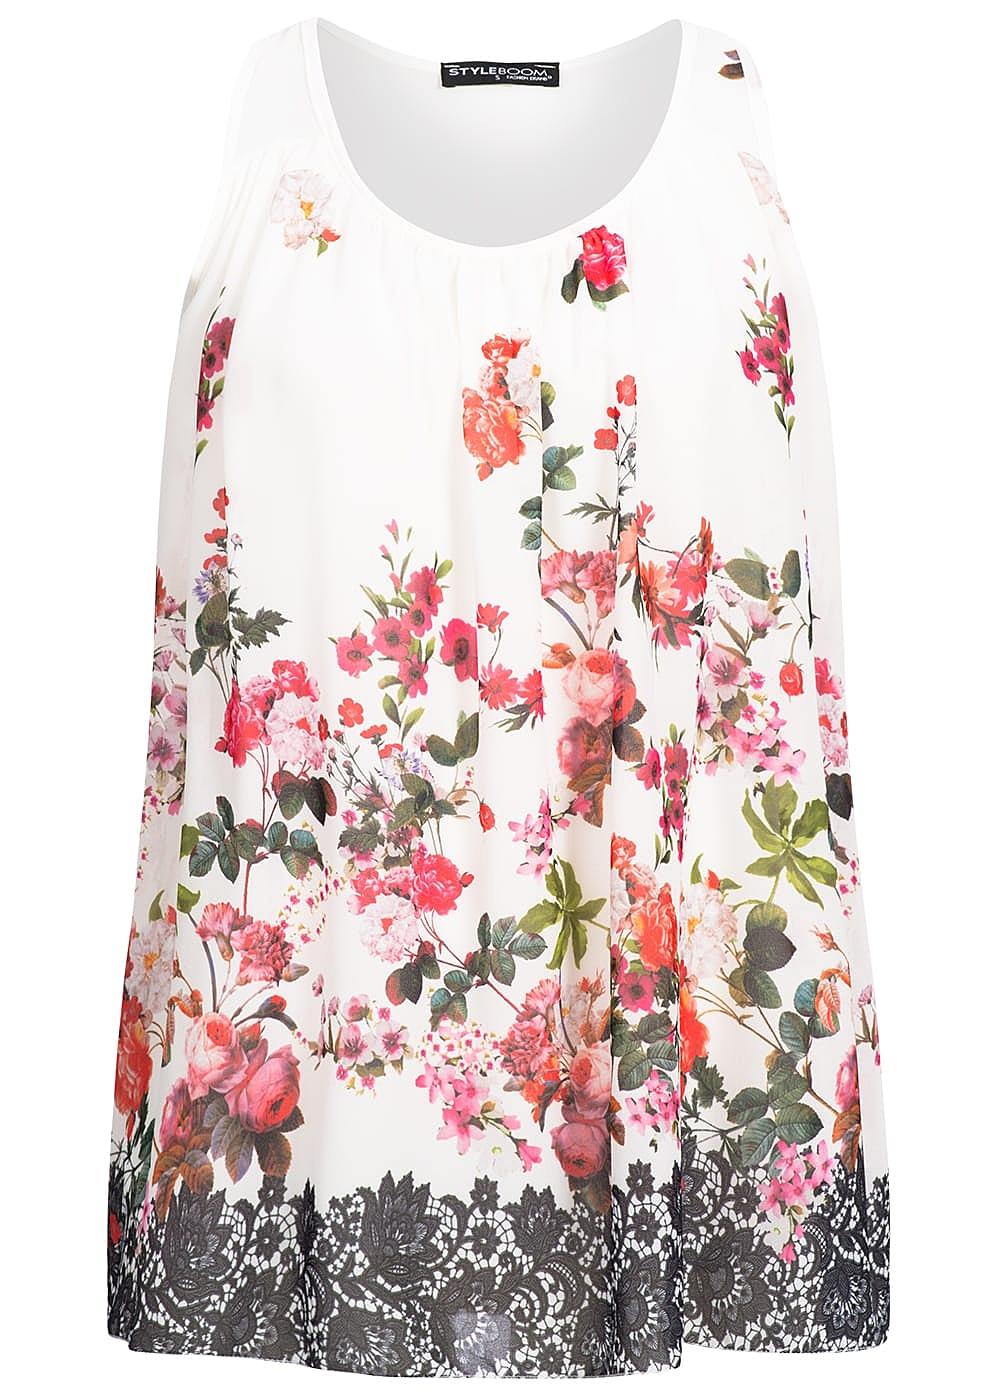 Styleboom Fashion Damen Chiffon Top Blumen Muster Weiss Rot